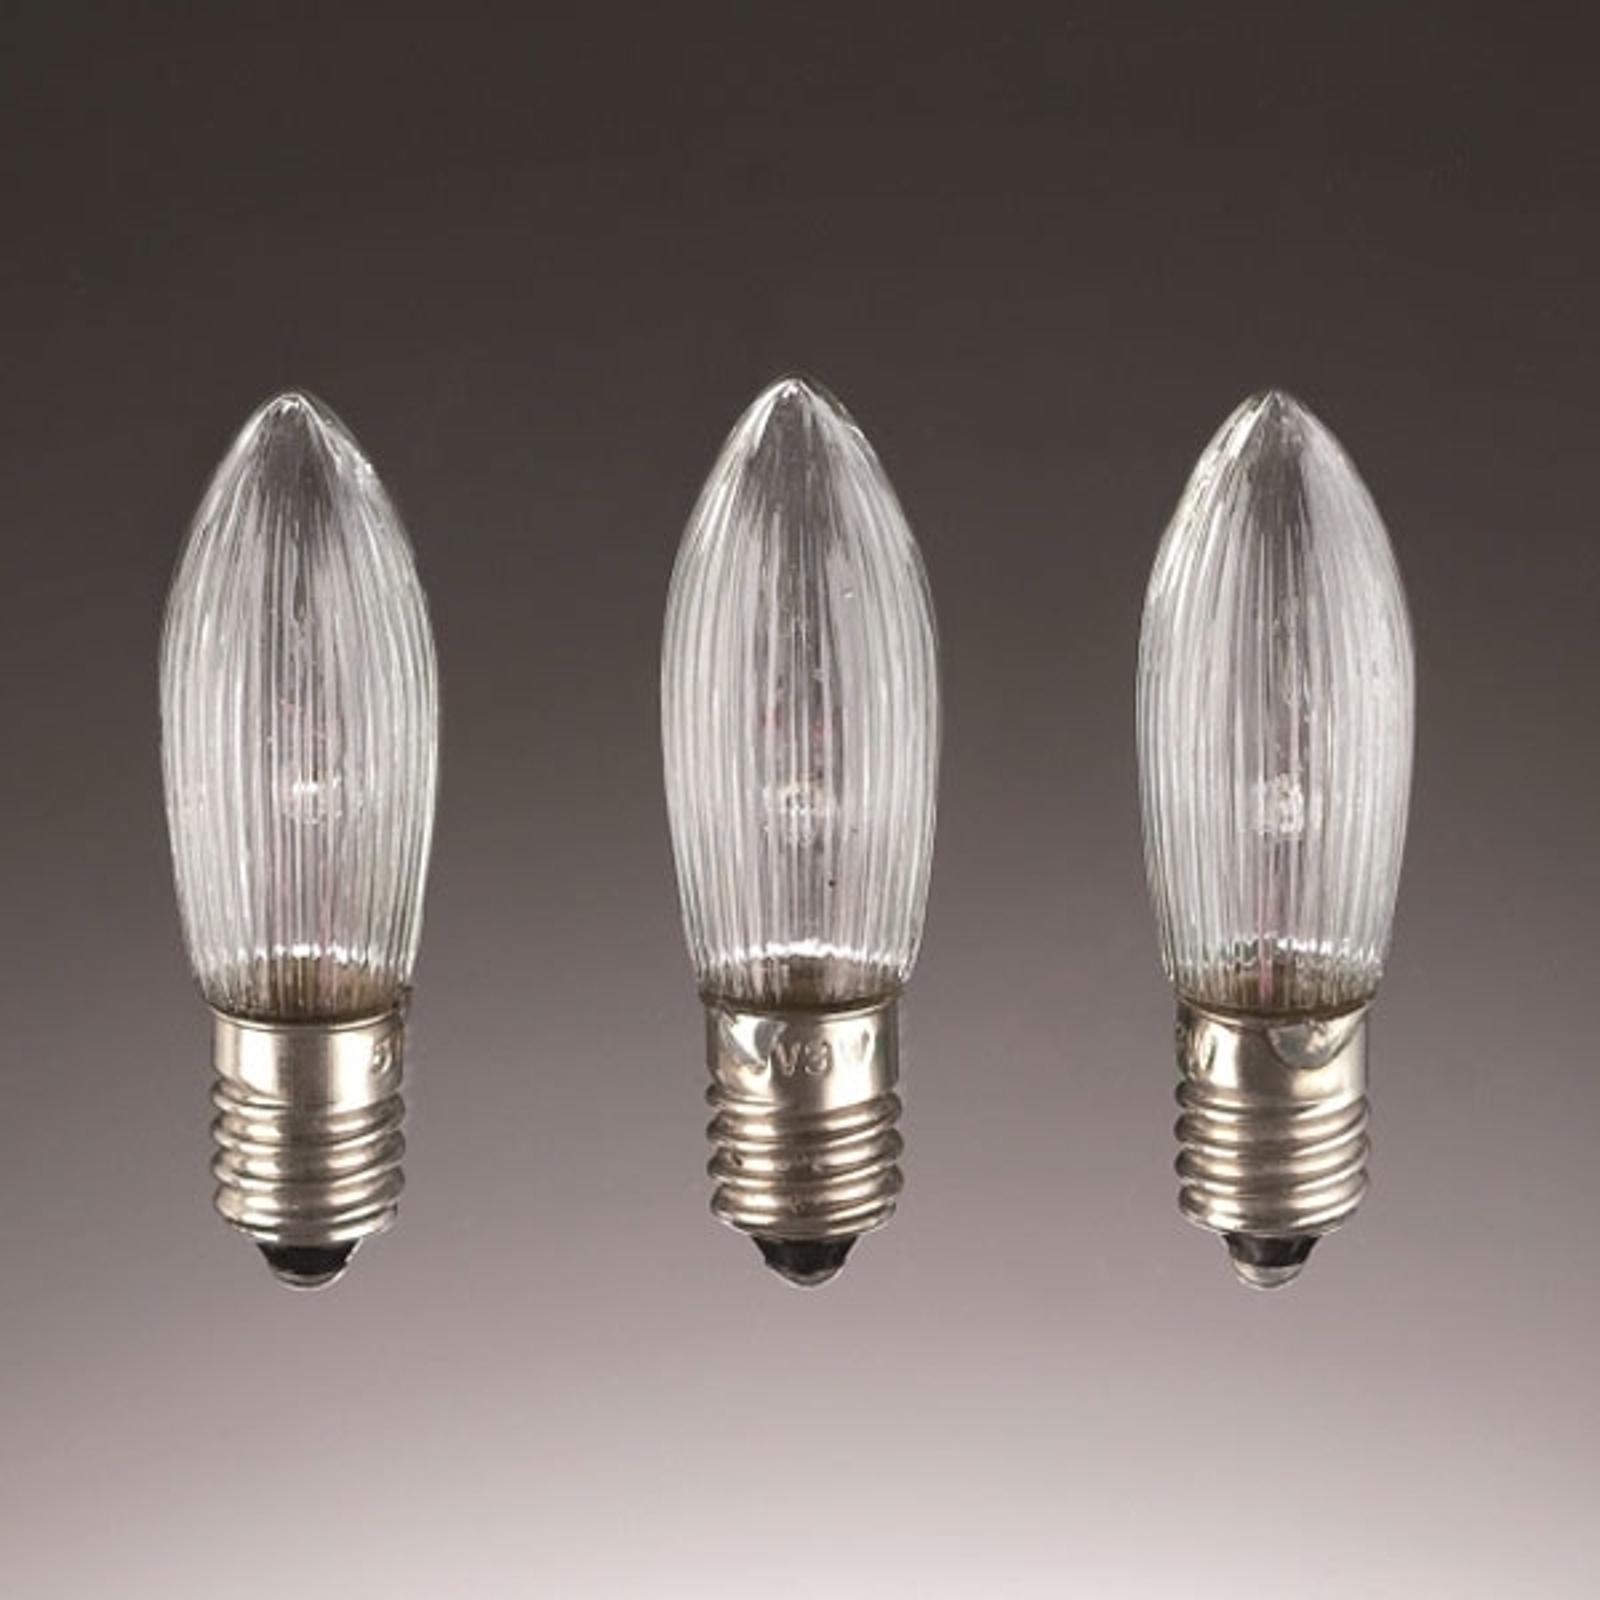 E10 ljuslampor 3W 34V reservlampor 3-pack